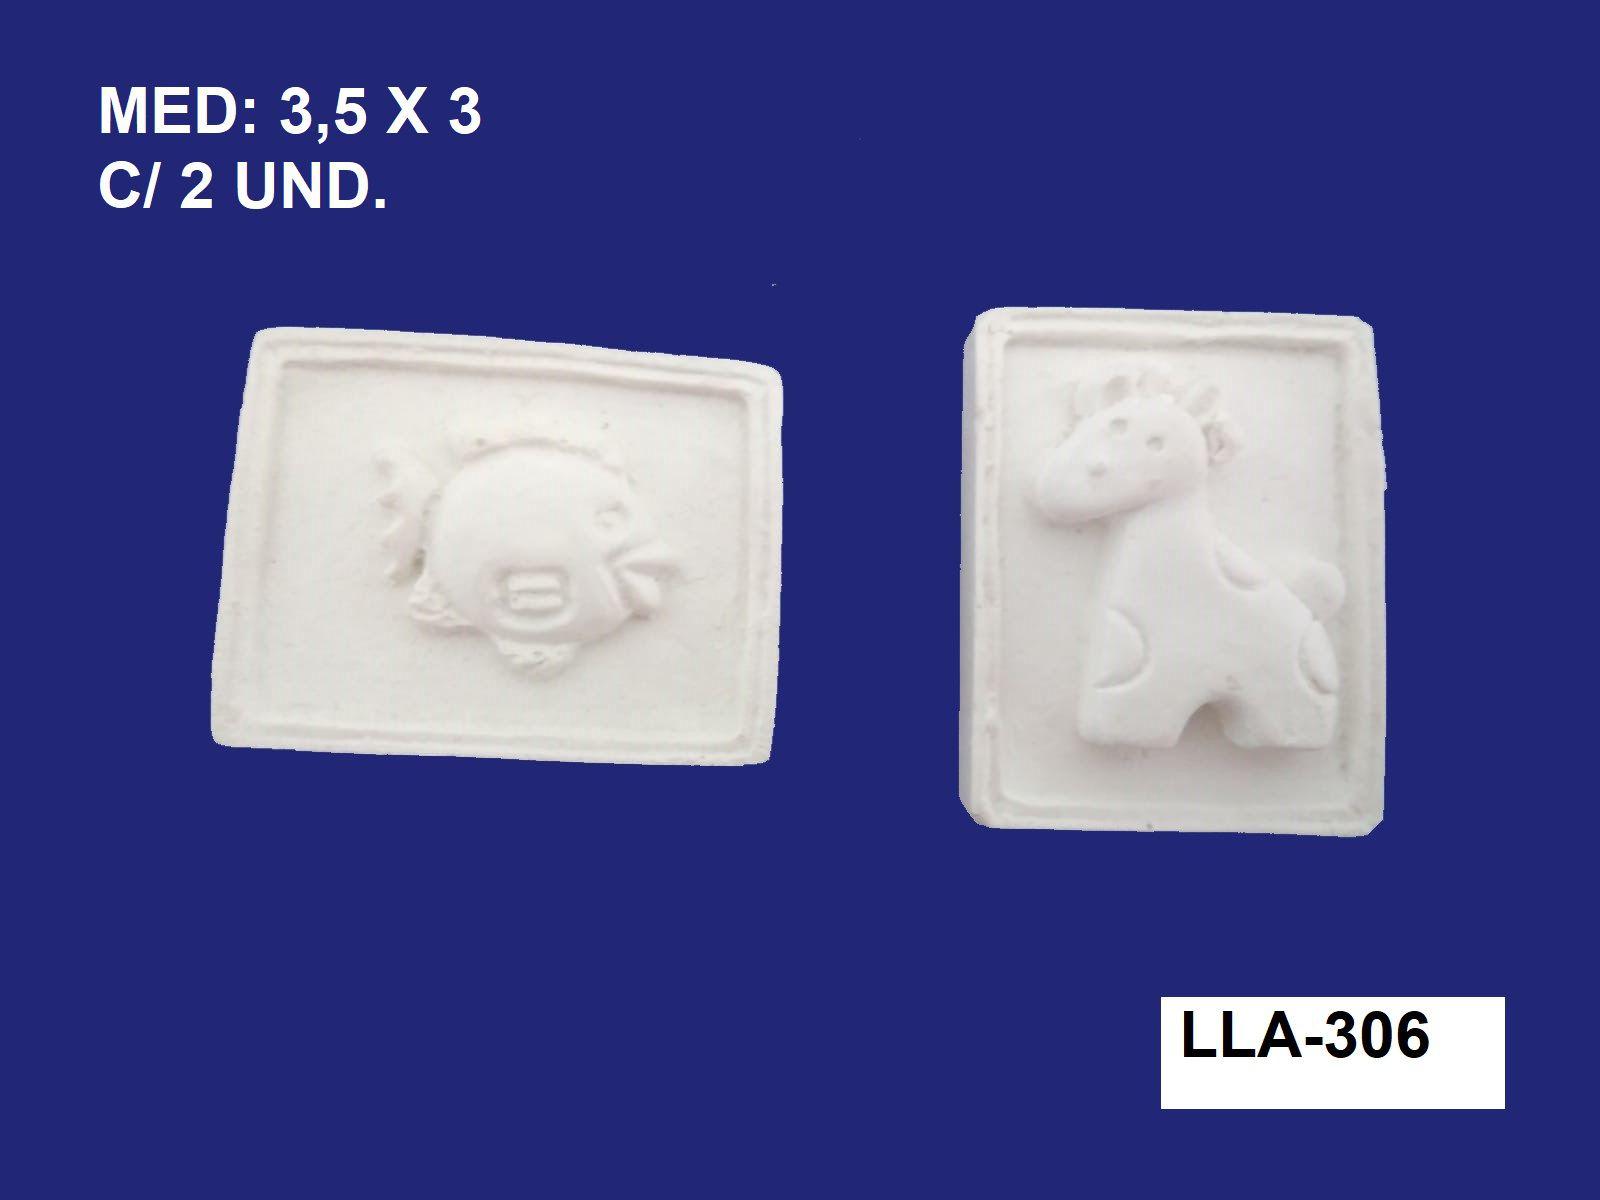 LLA-306 APLIQUE ANIMAL 2,5X3CM C/ 2 UND.